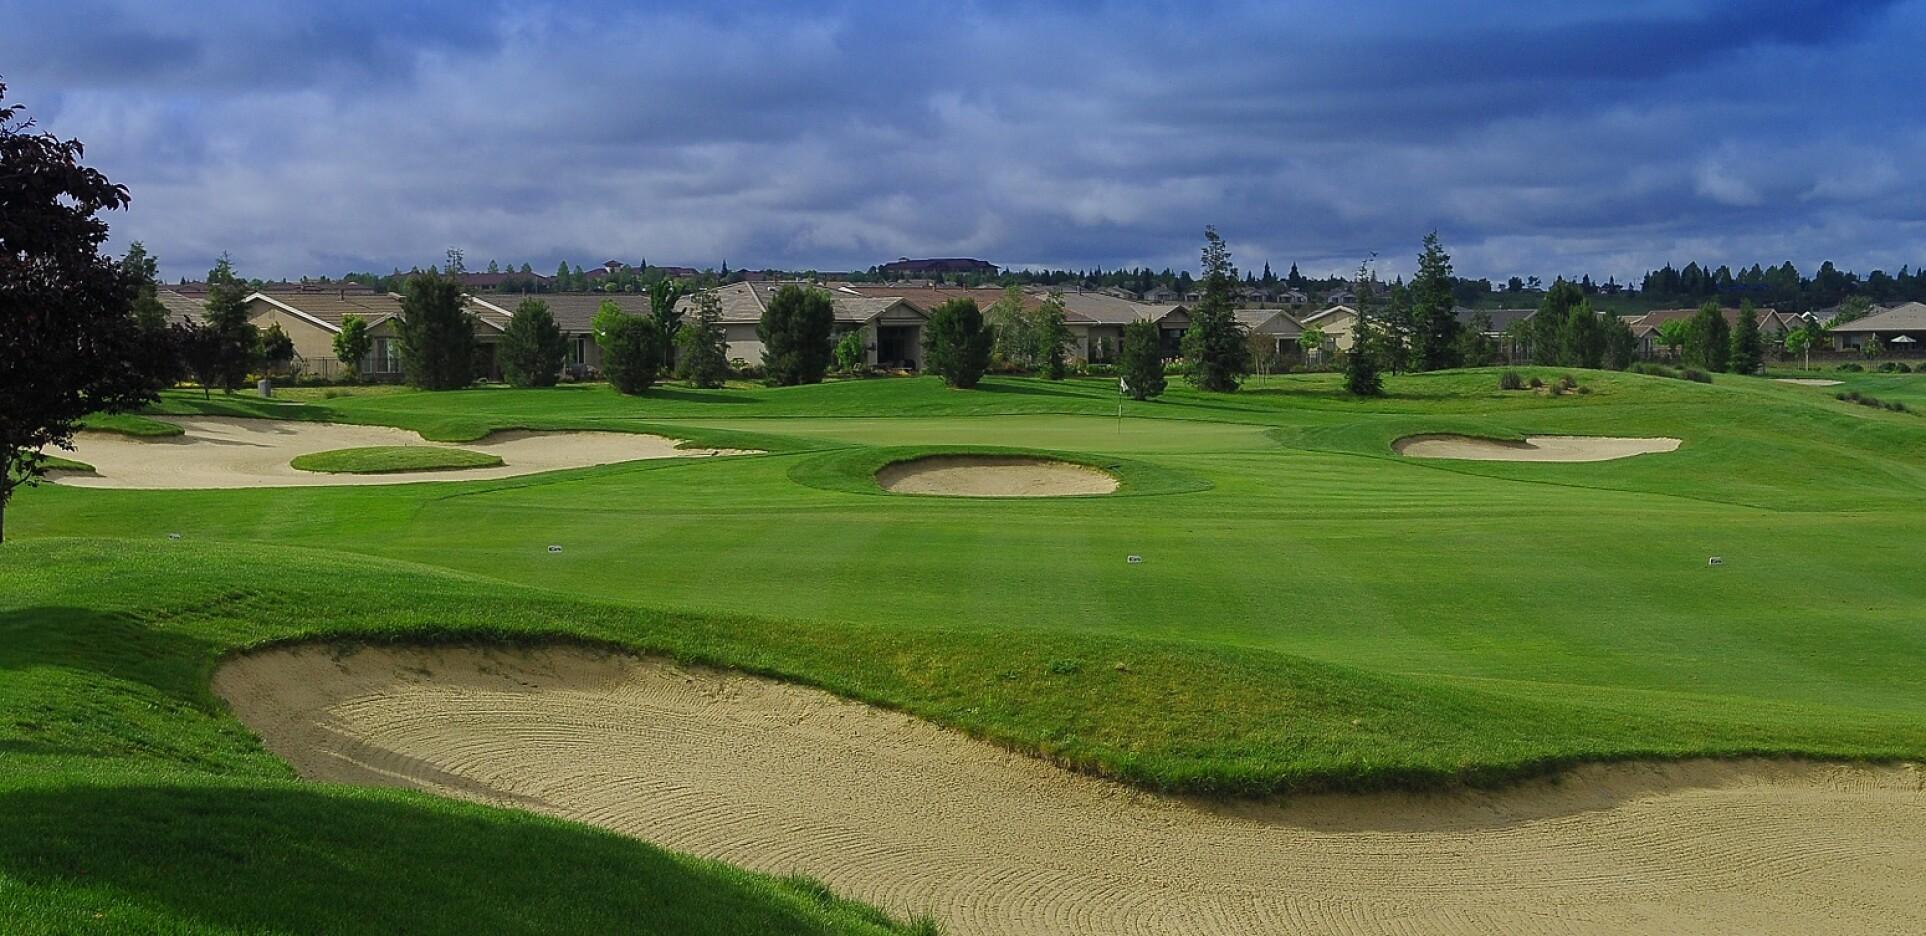 Lincoln Hills Golf Course in Lincoln, California